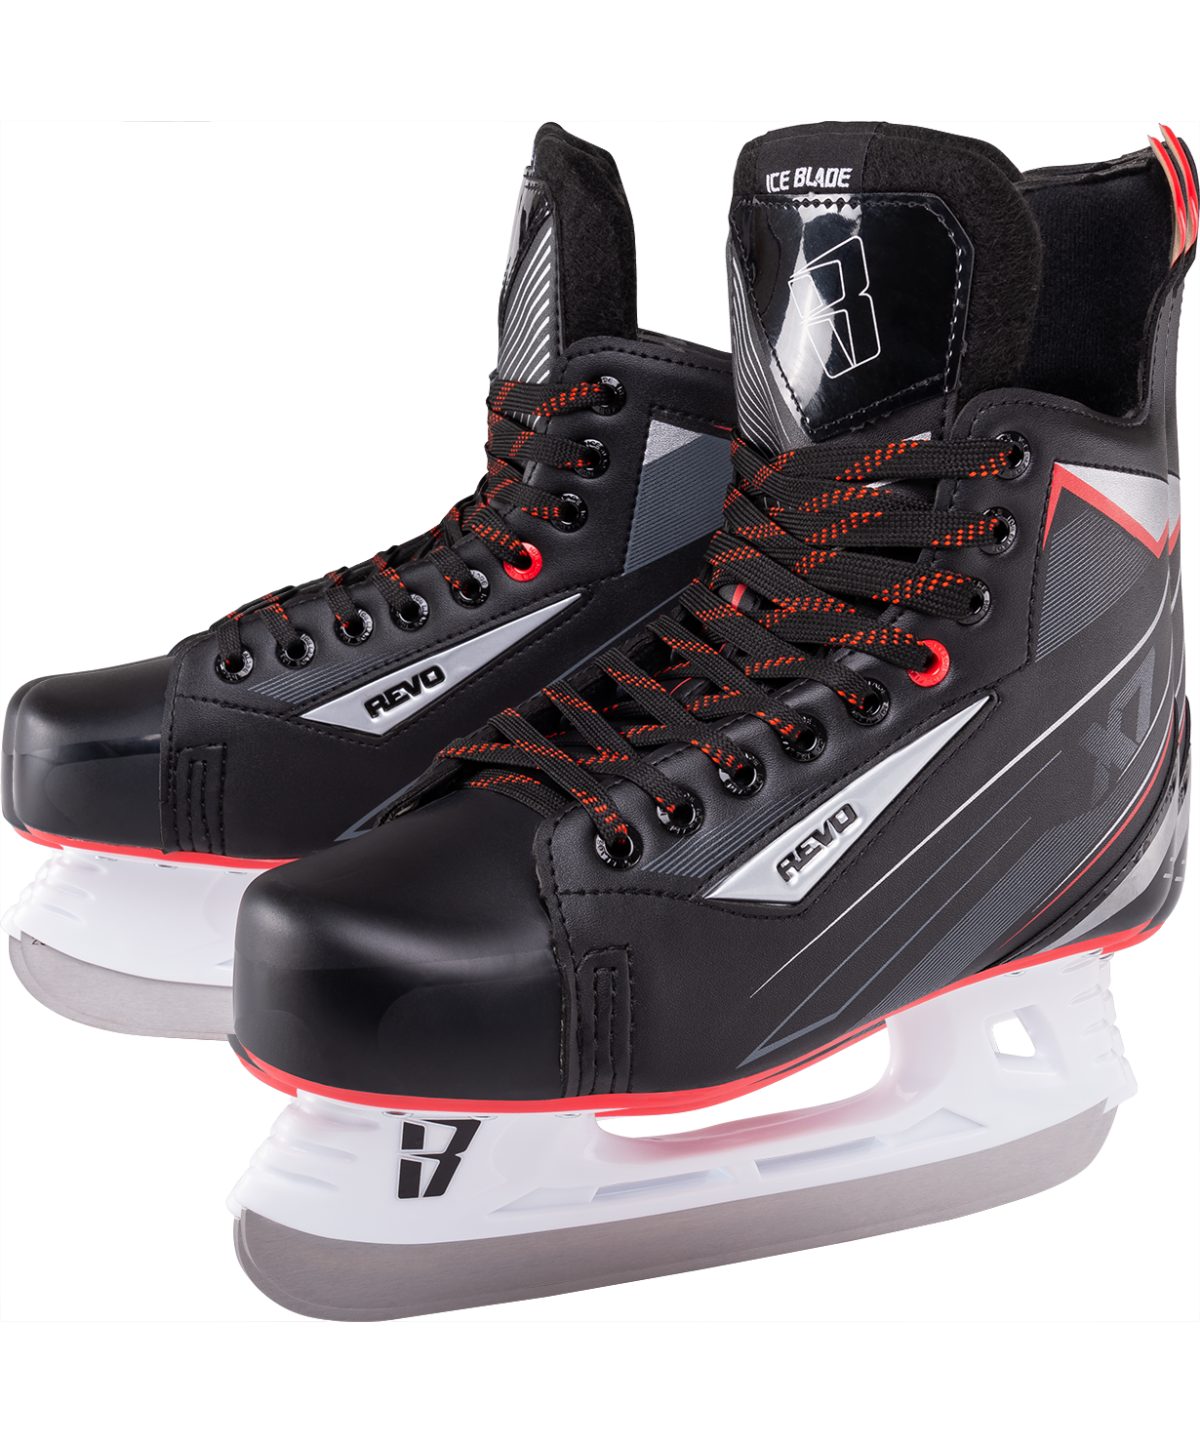 ICE BLADE Коньки хоккейные Revo Х7.0 - 2